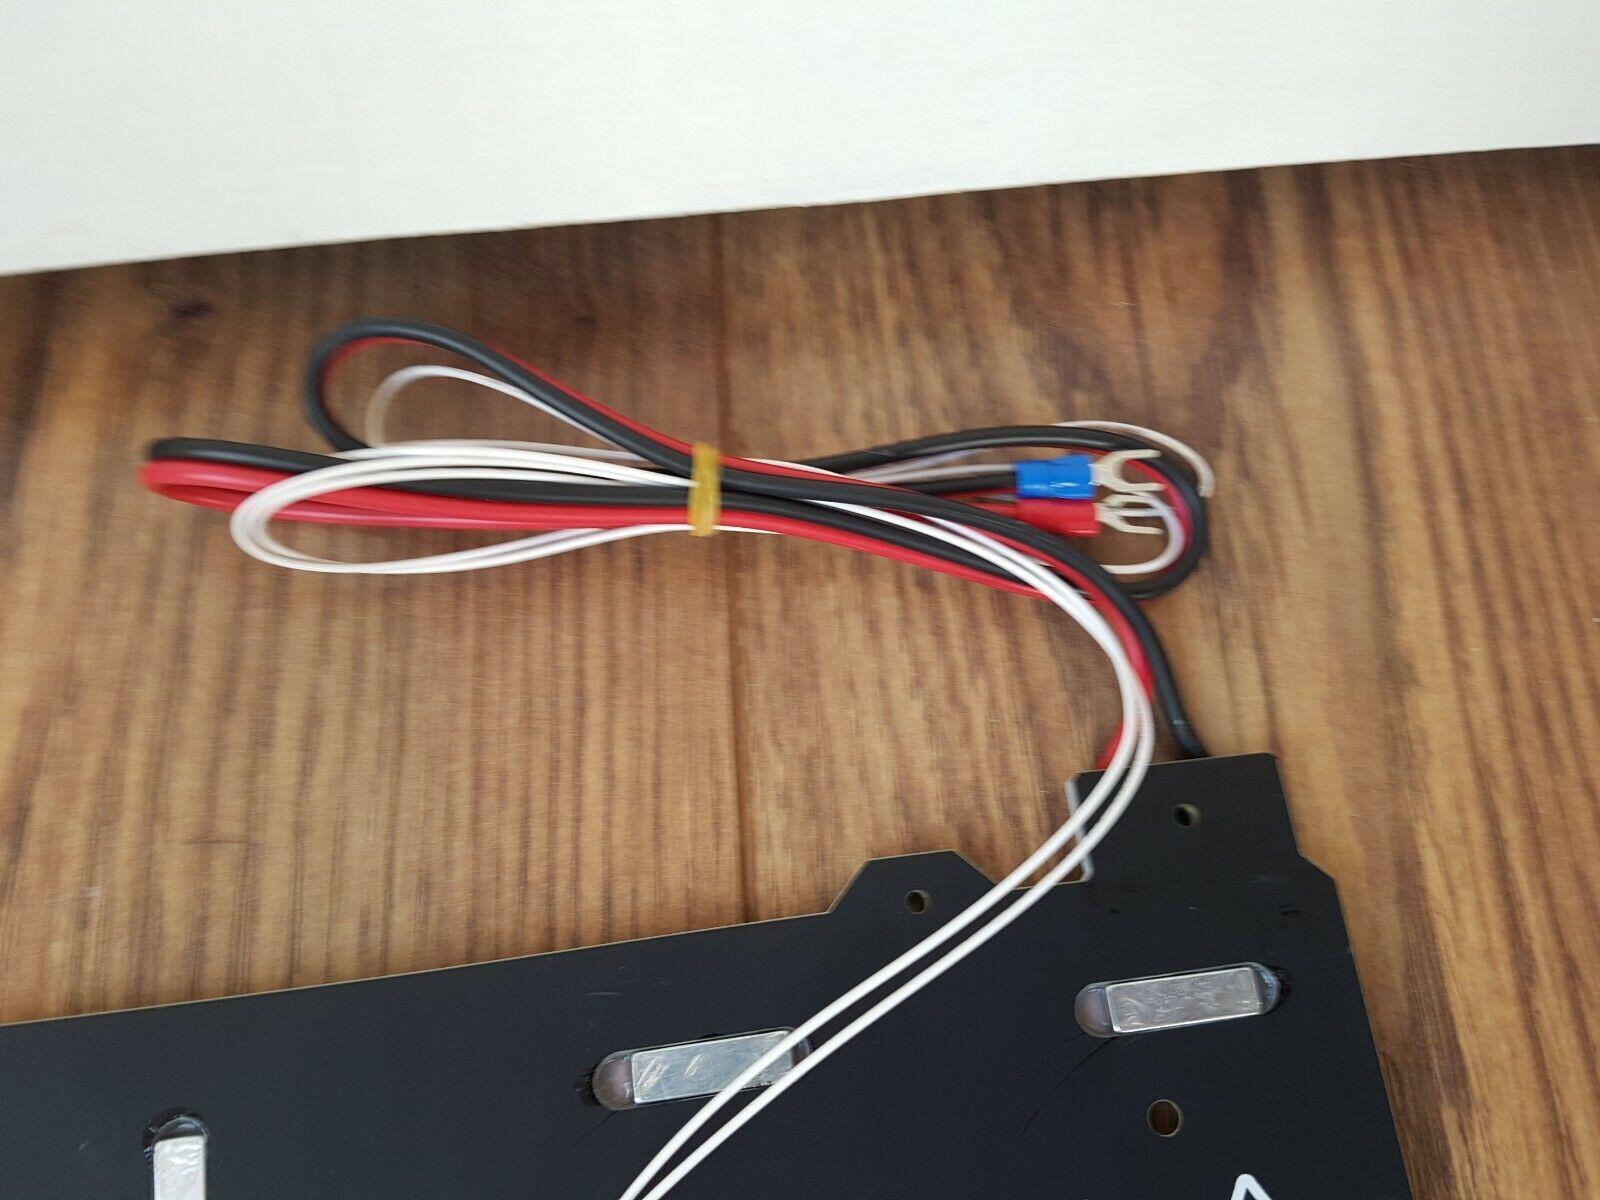 Magnetic Heated Bed 300/300mm 24V + PEI Steel Plate 3D Printer